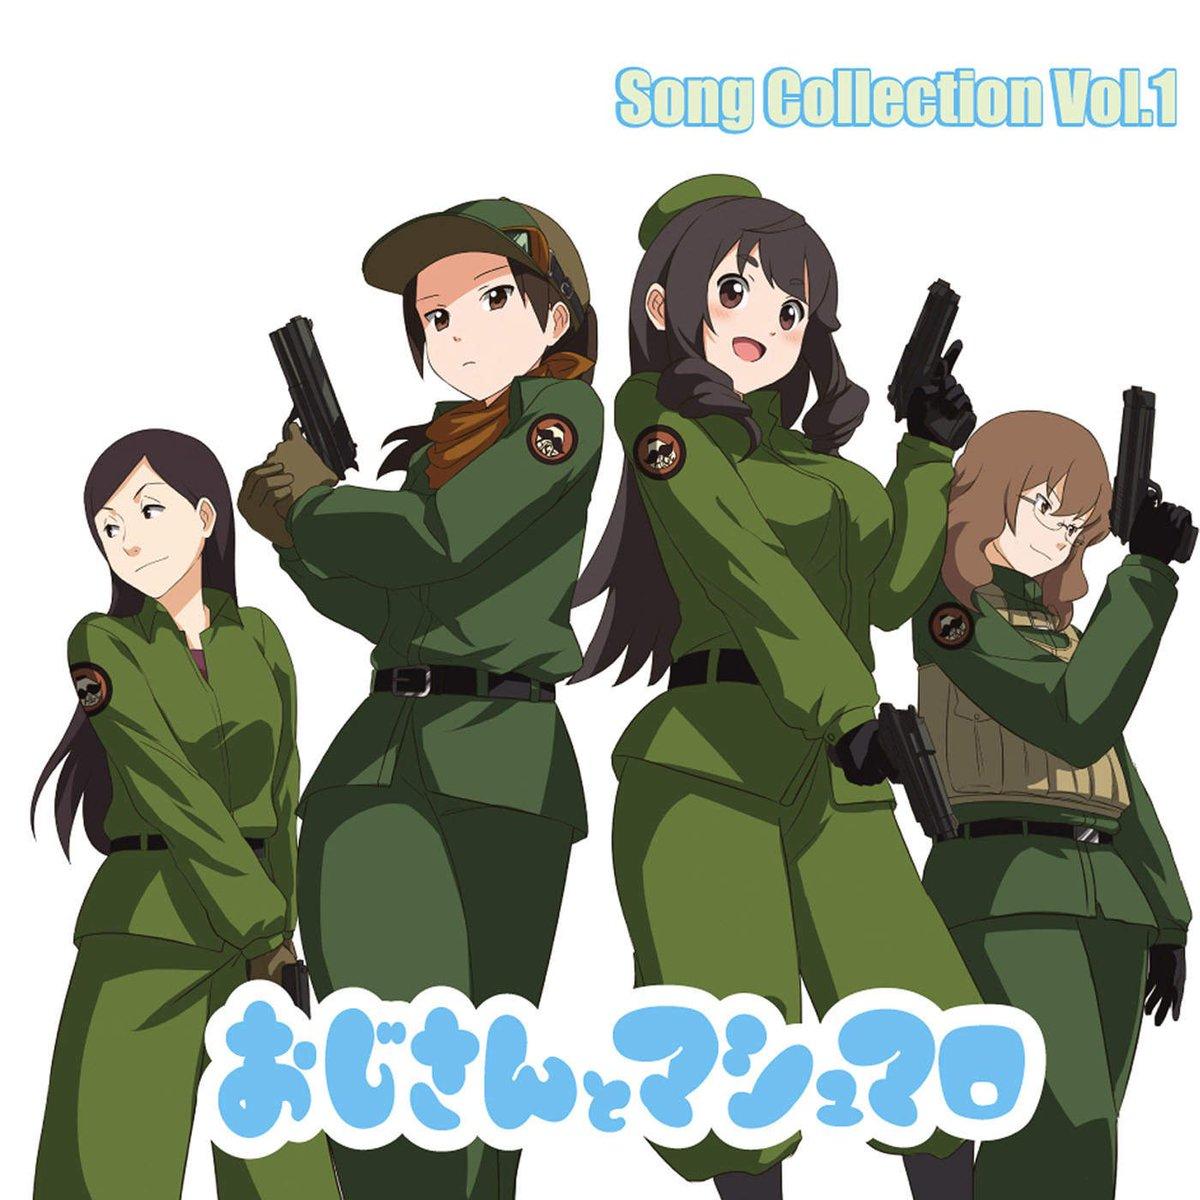 NowPlaying メッセージ - 喜多村英梨(Album:おじさんとマシュマロ Song Collection Vo